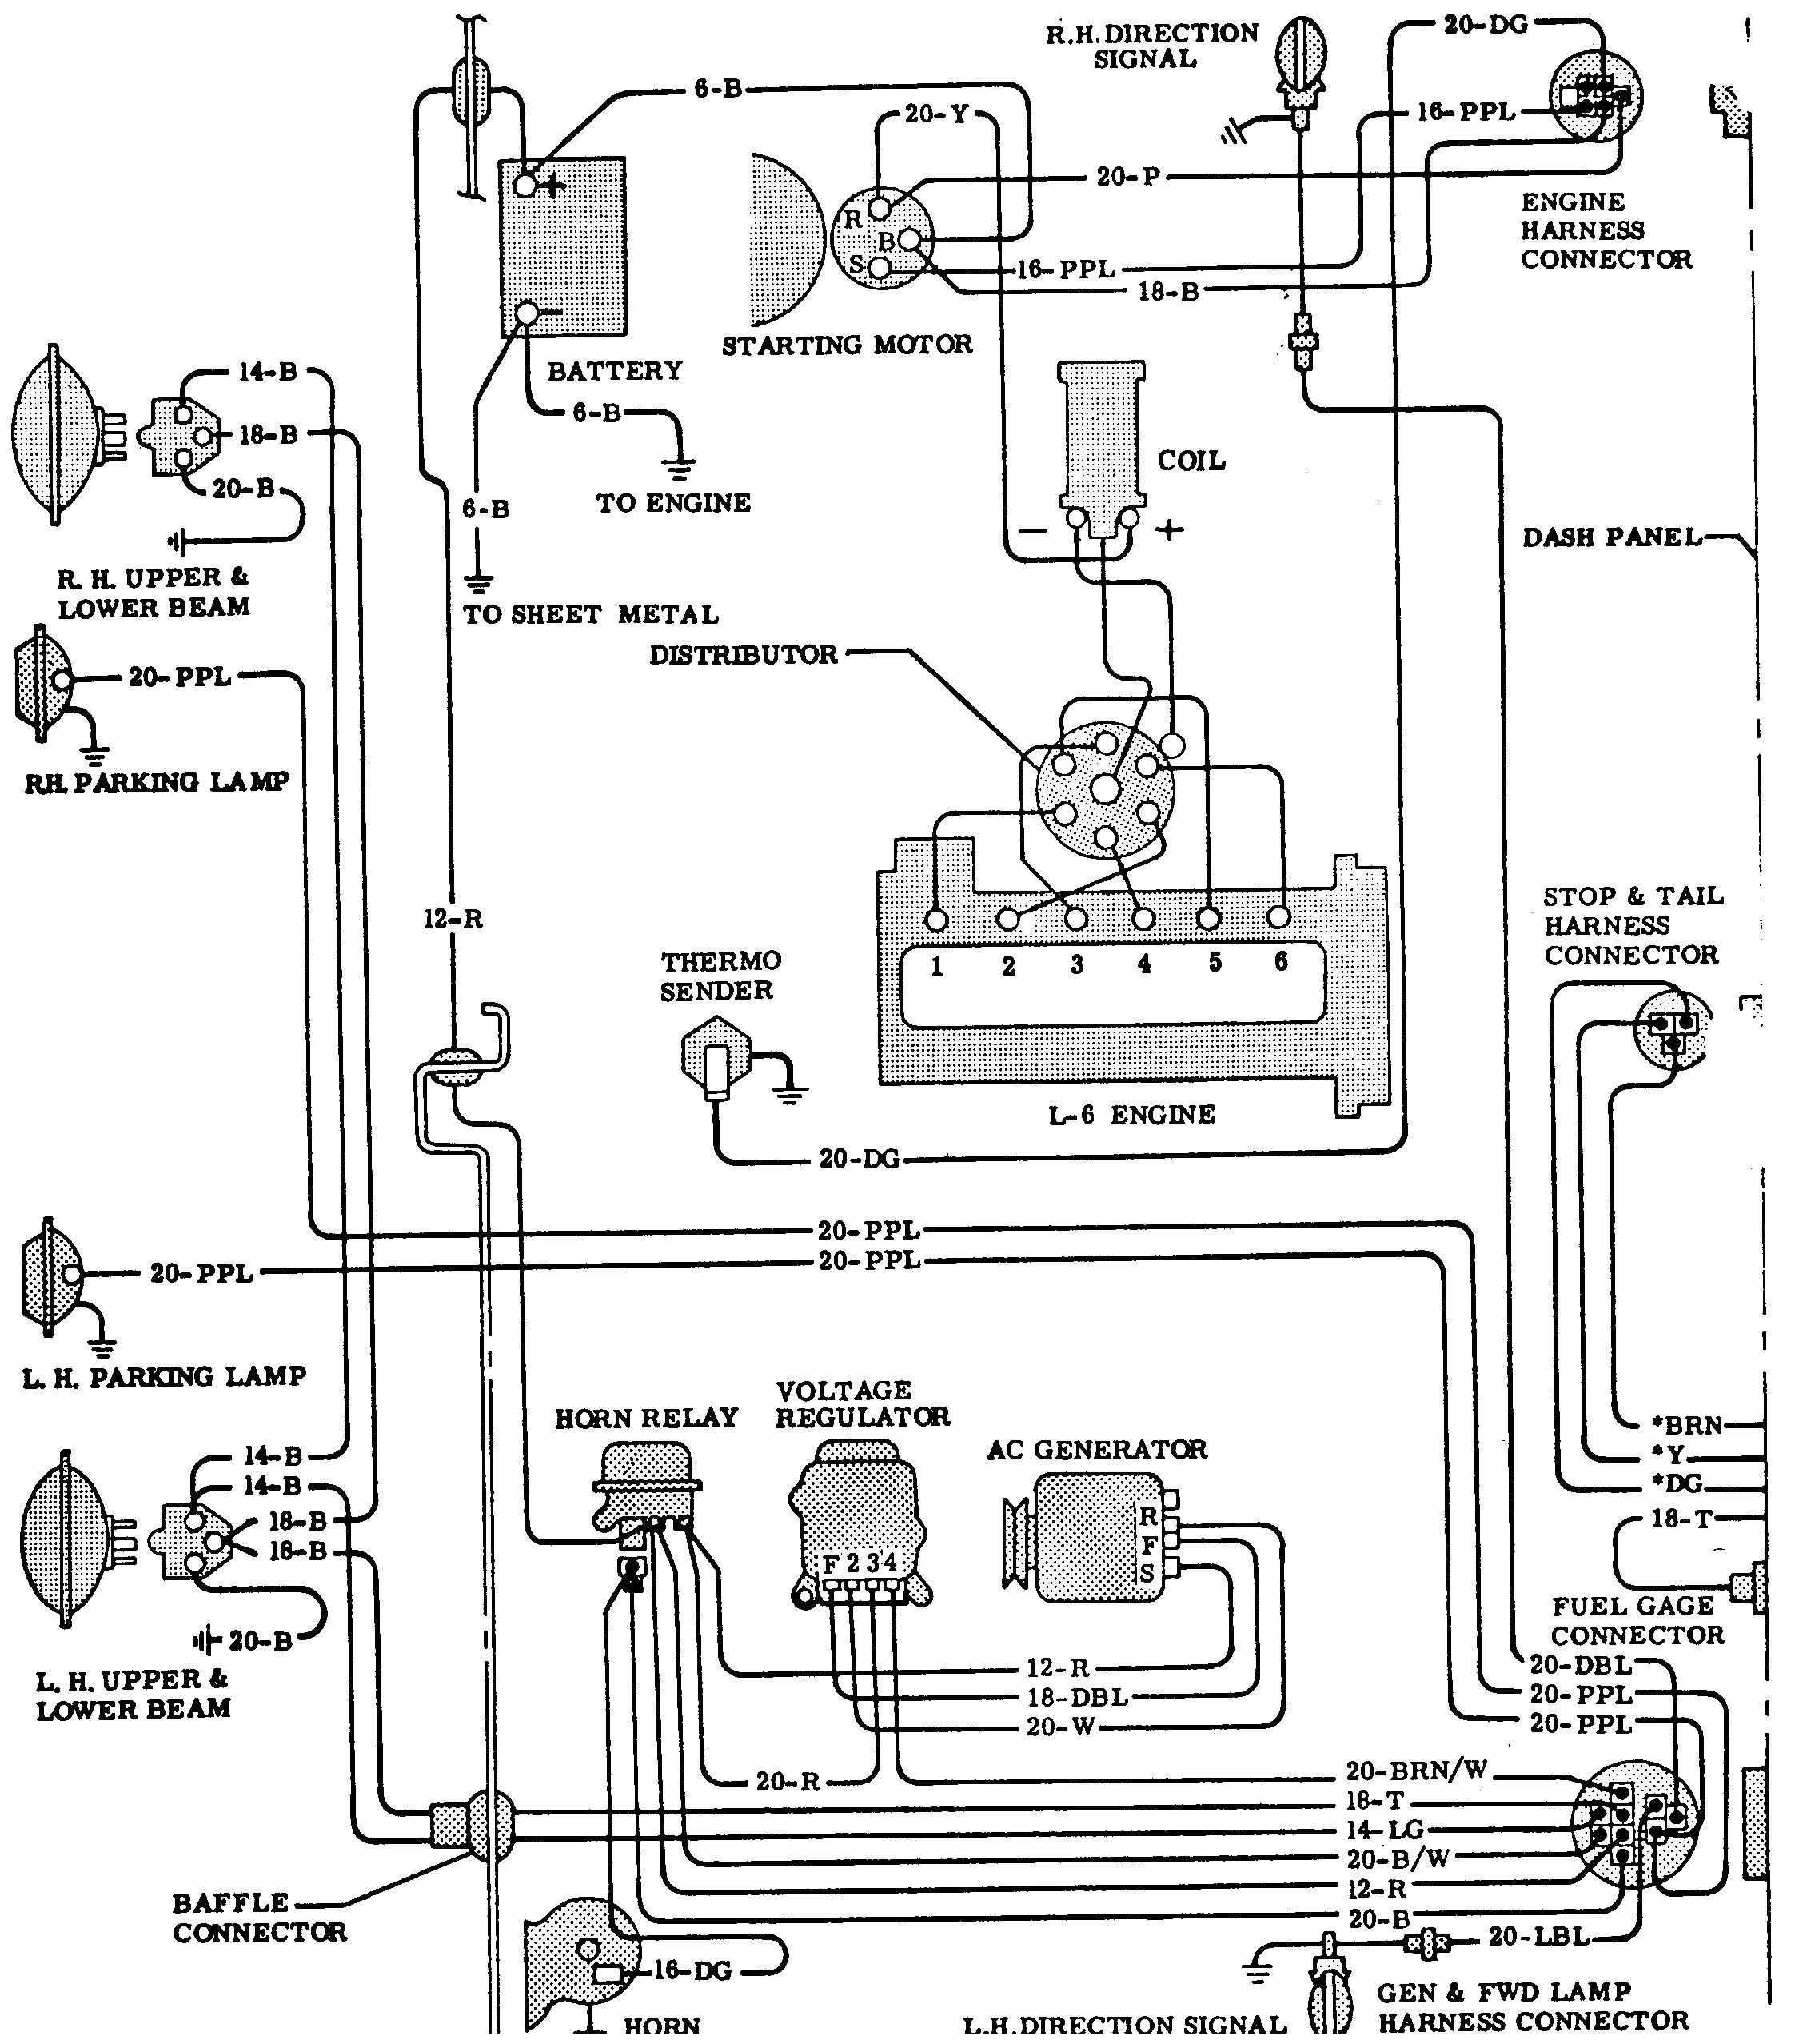 Chevrolet Truck Parts Diagram 78 Chevy Starter Wiring Silverado 1500 Classic Air Of